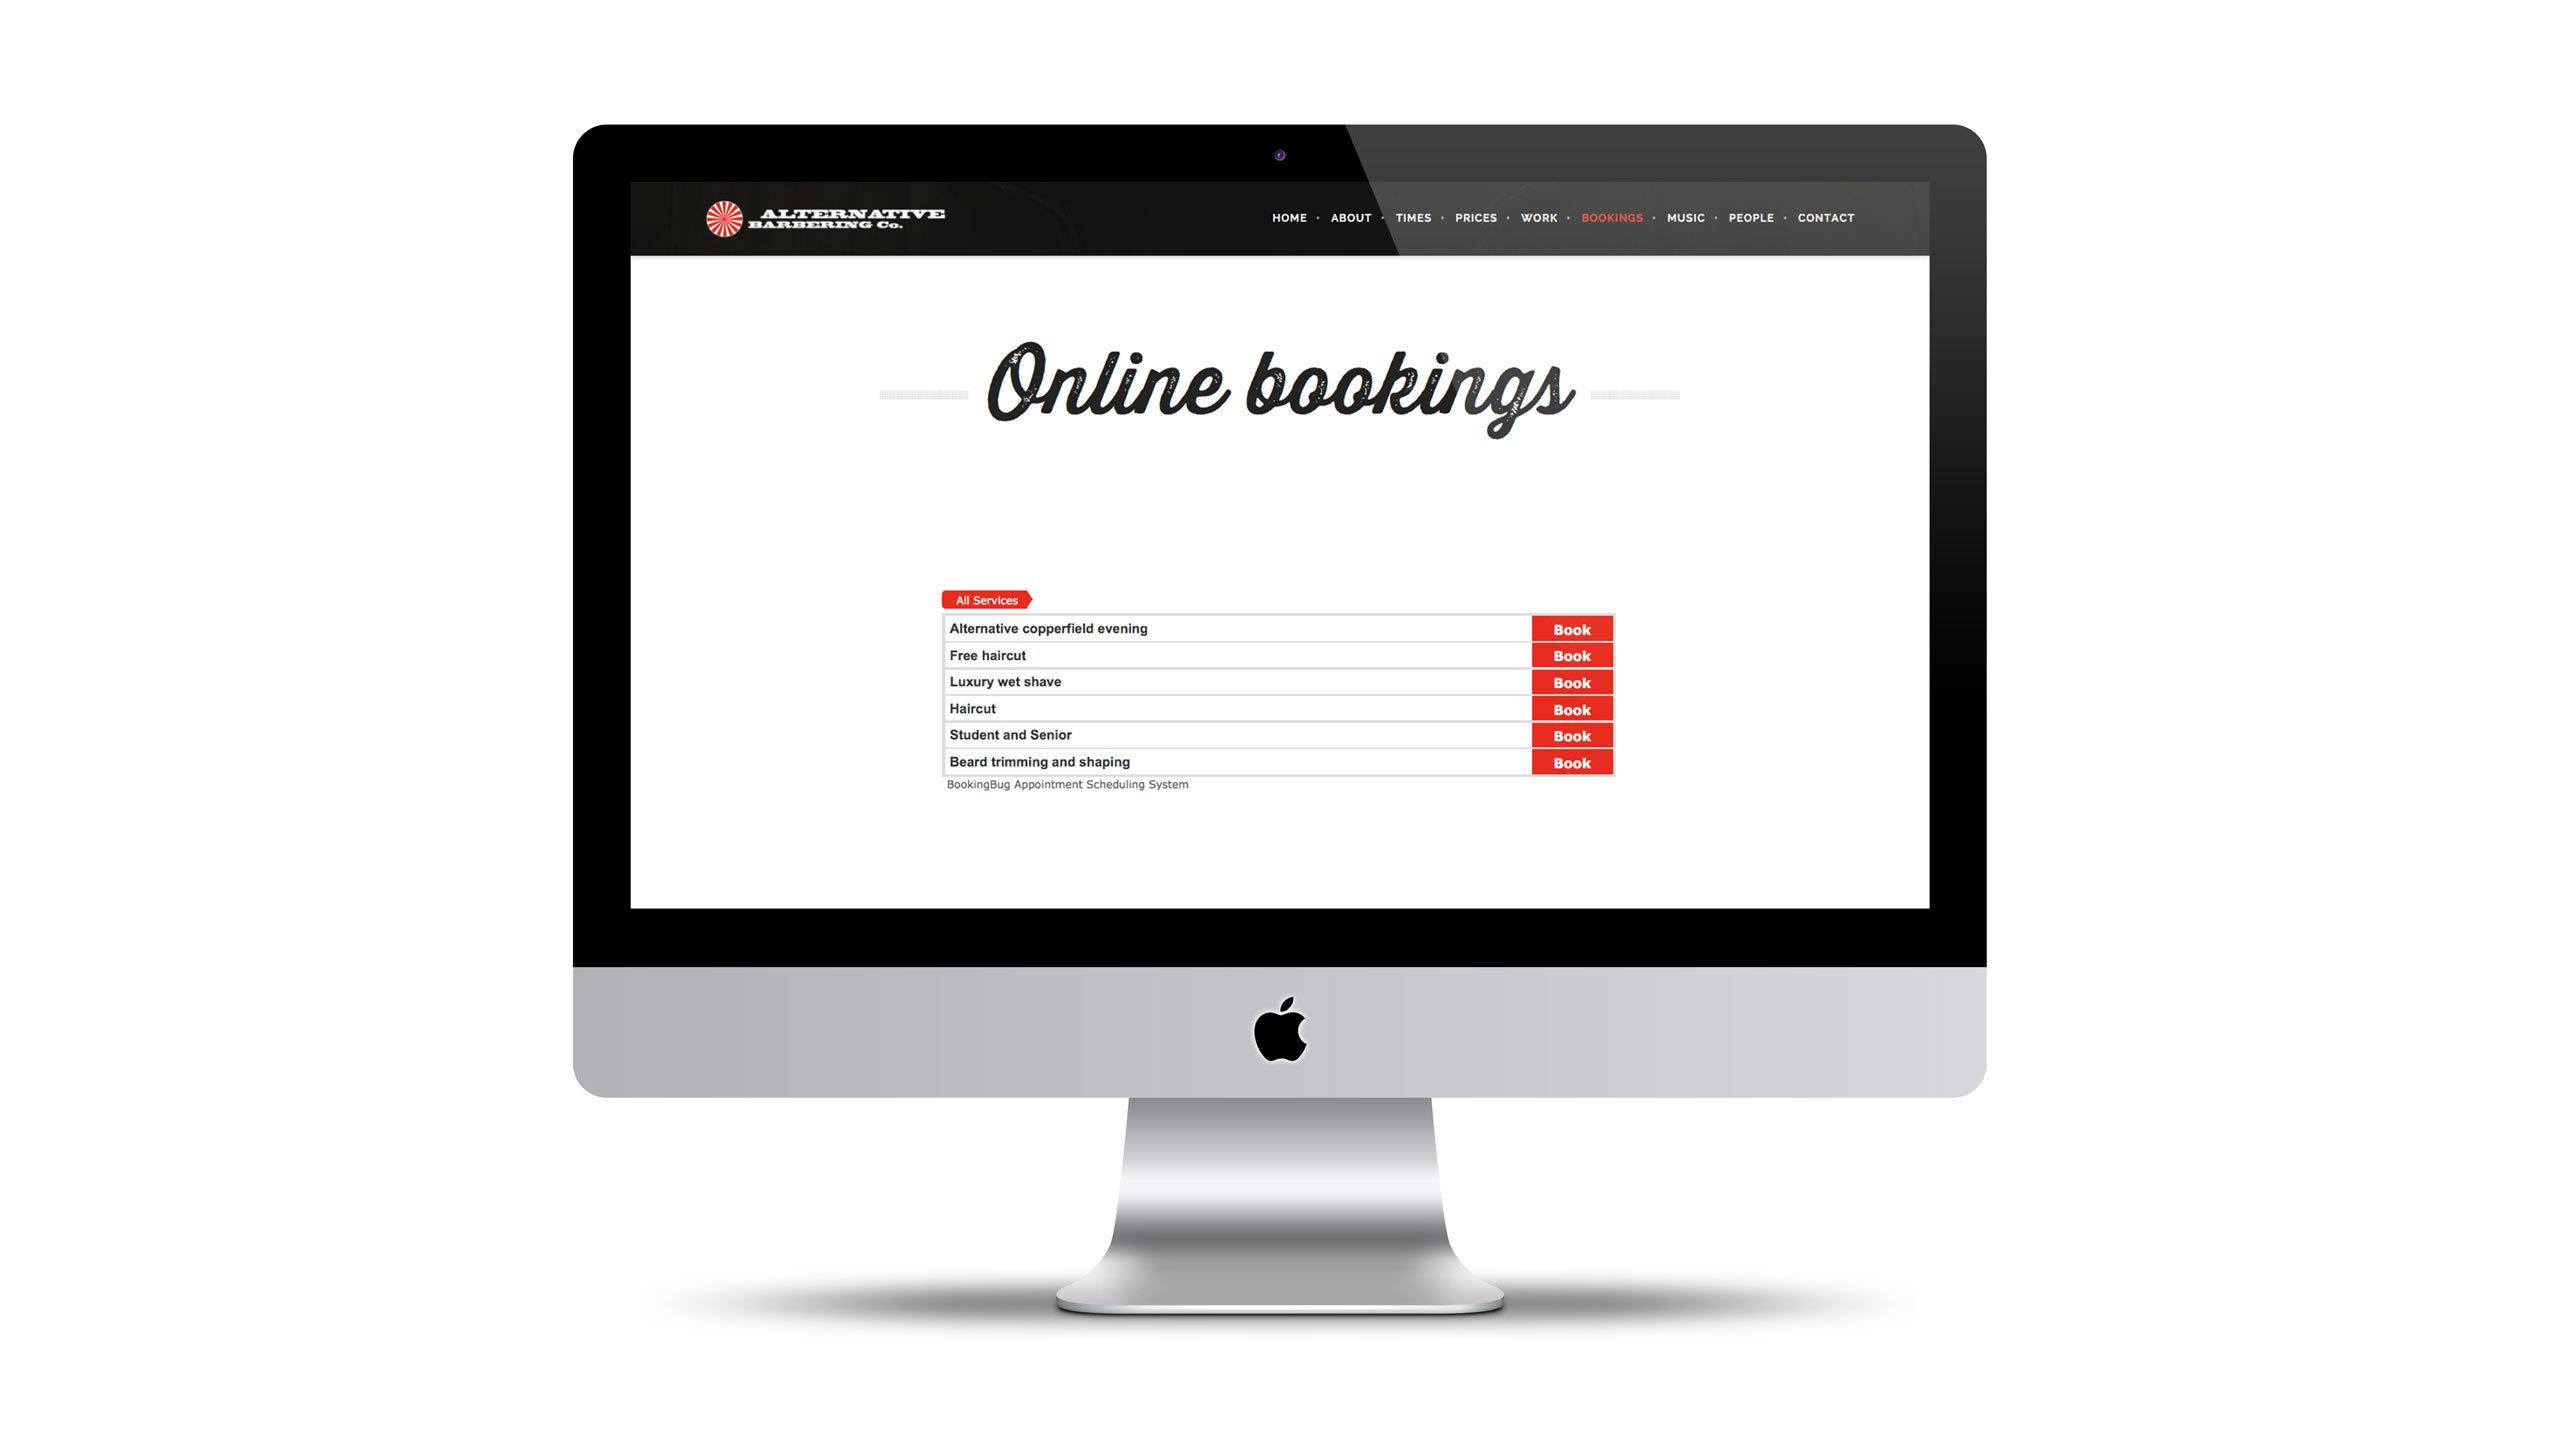 barbershop website design online booking page alternative barbering co